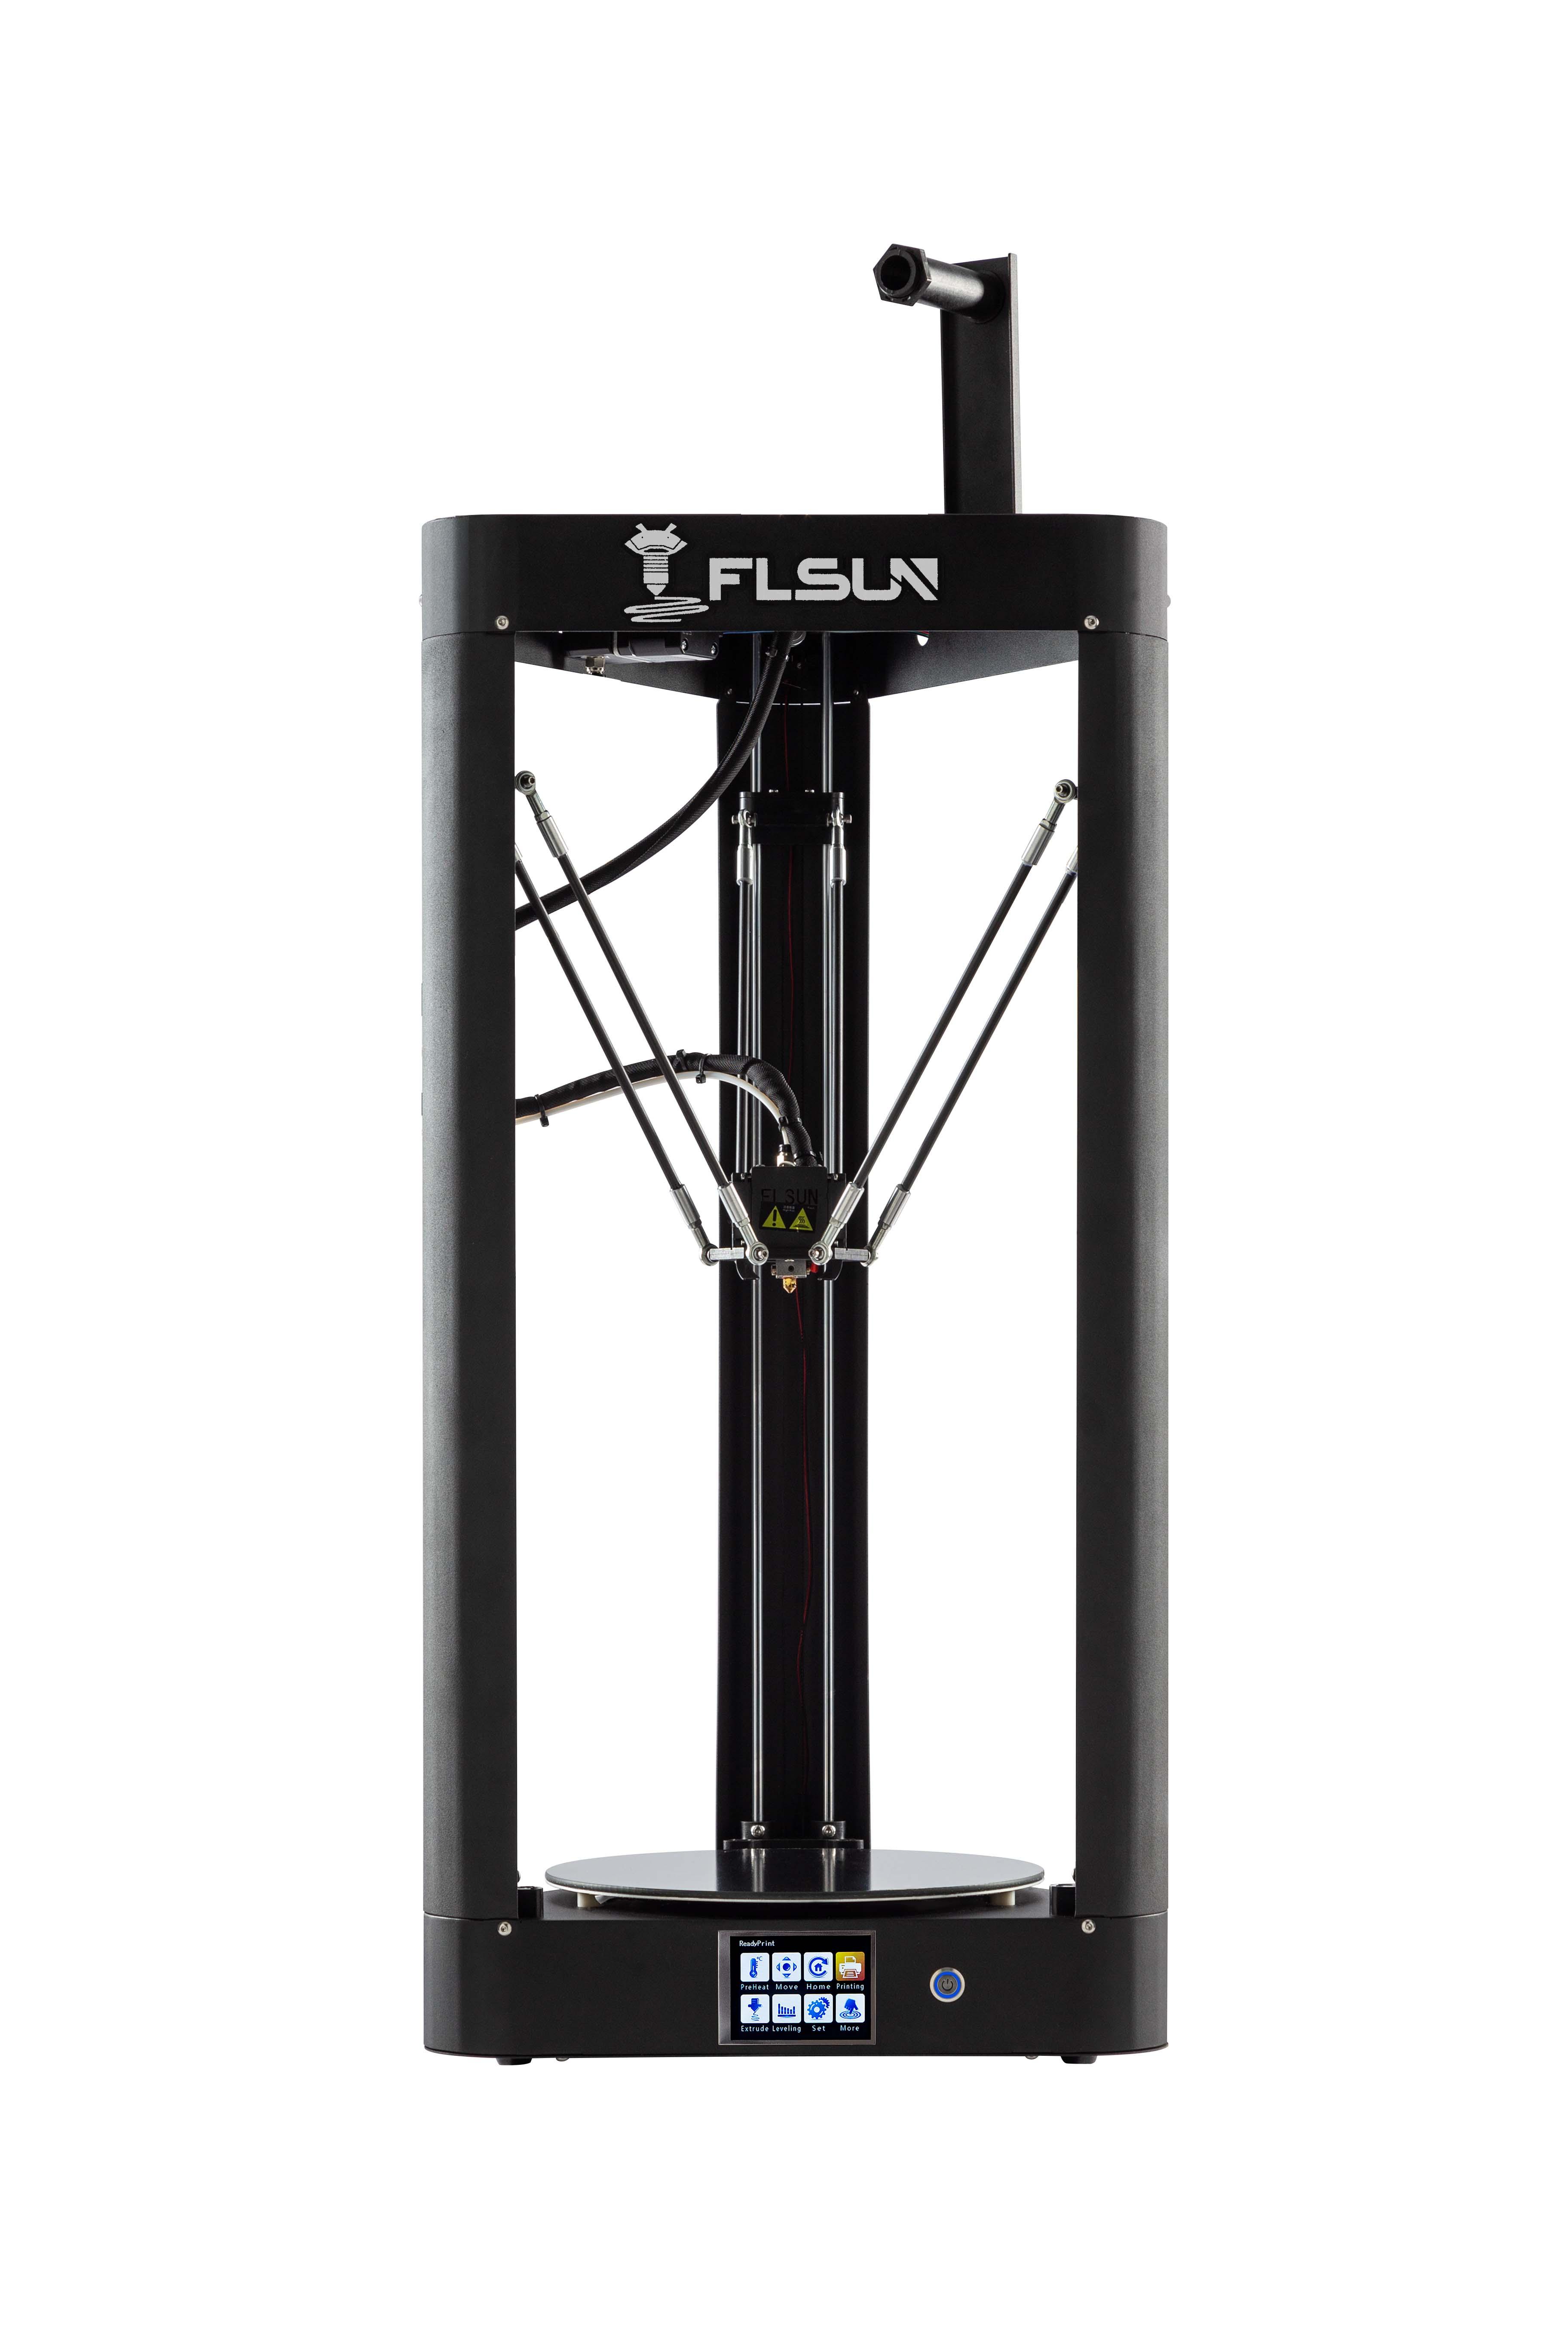 FLSUN-QQ Pre assembled Large Delta 3D Printer - Solid Metal Frame